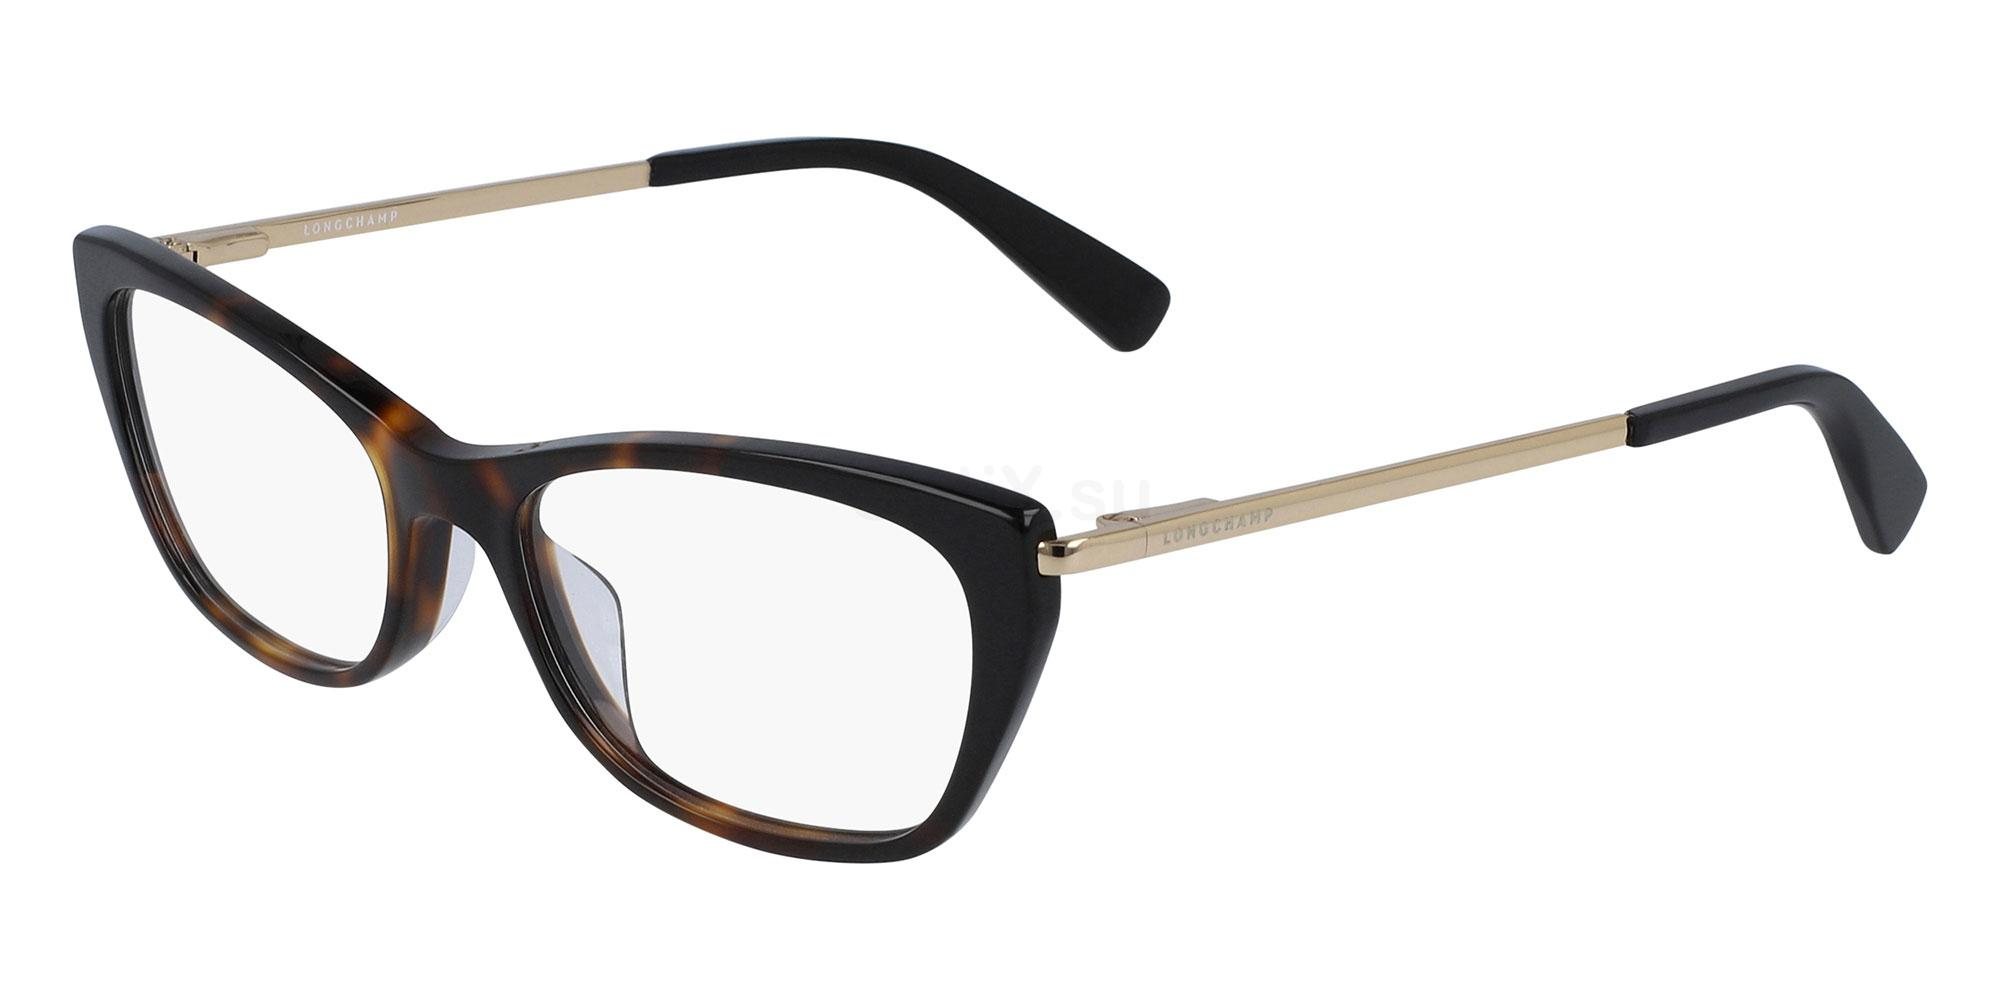 214 LO2639 Glasses, LONGCHAMP